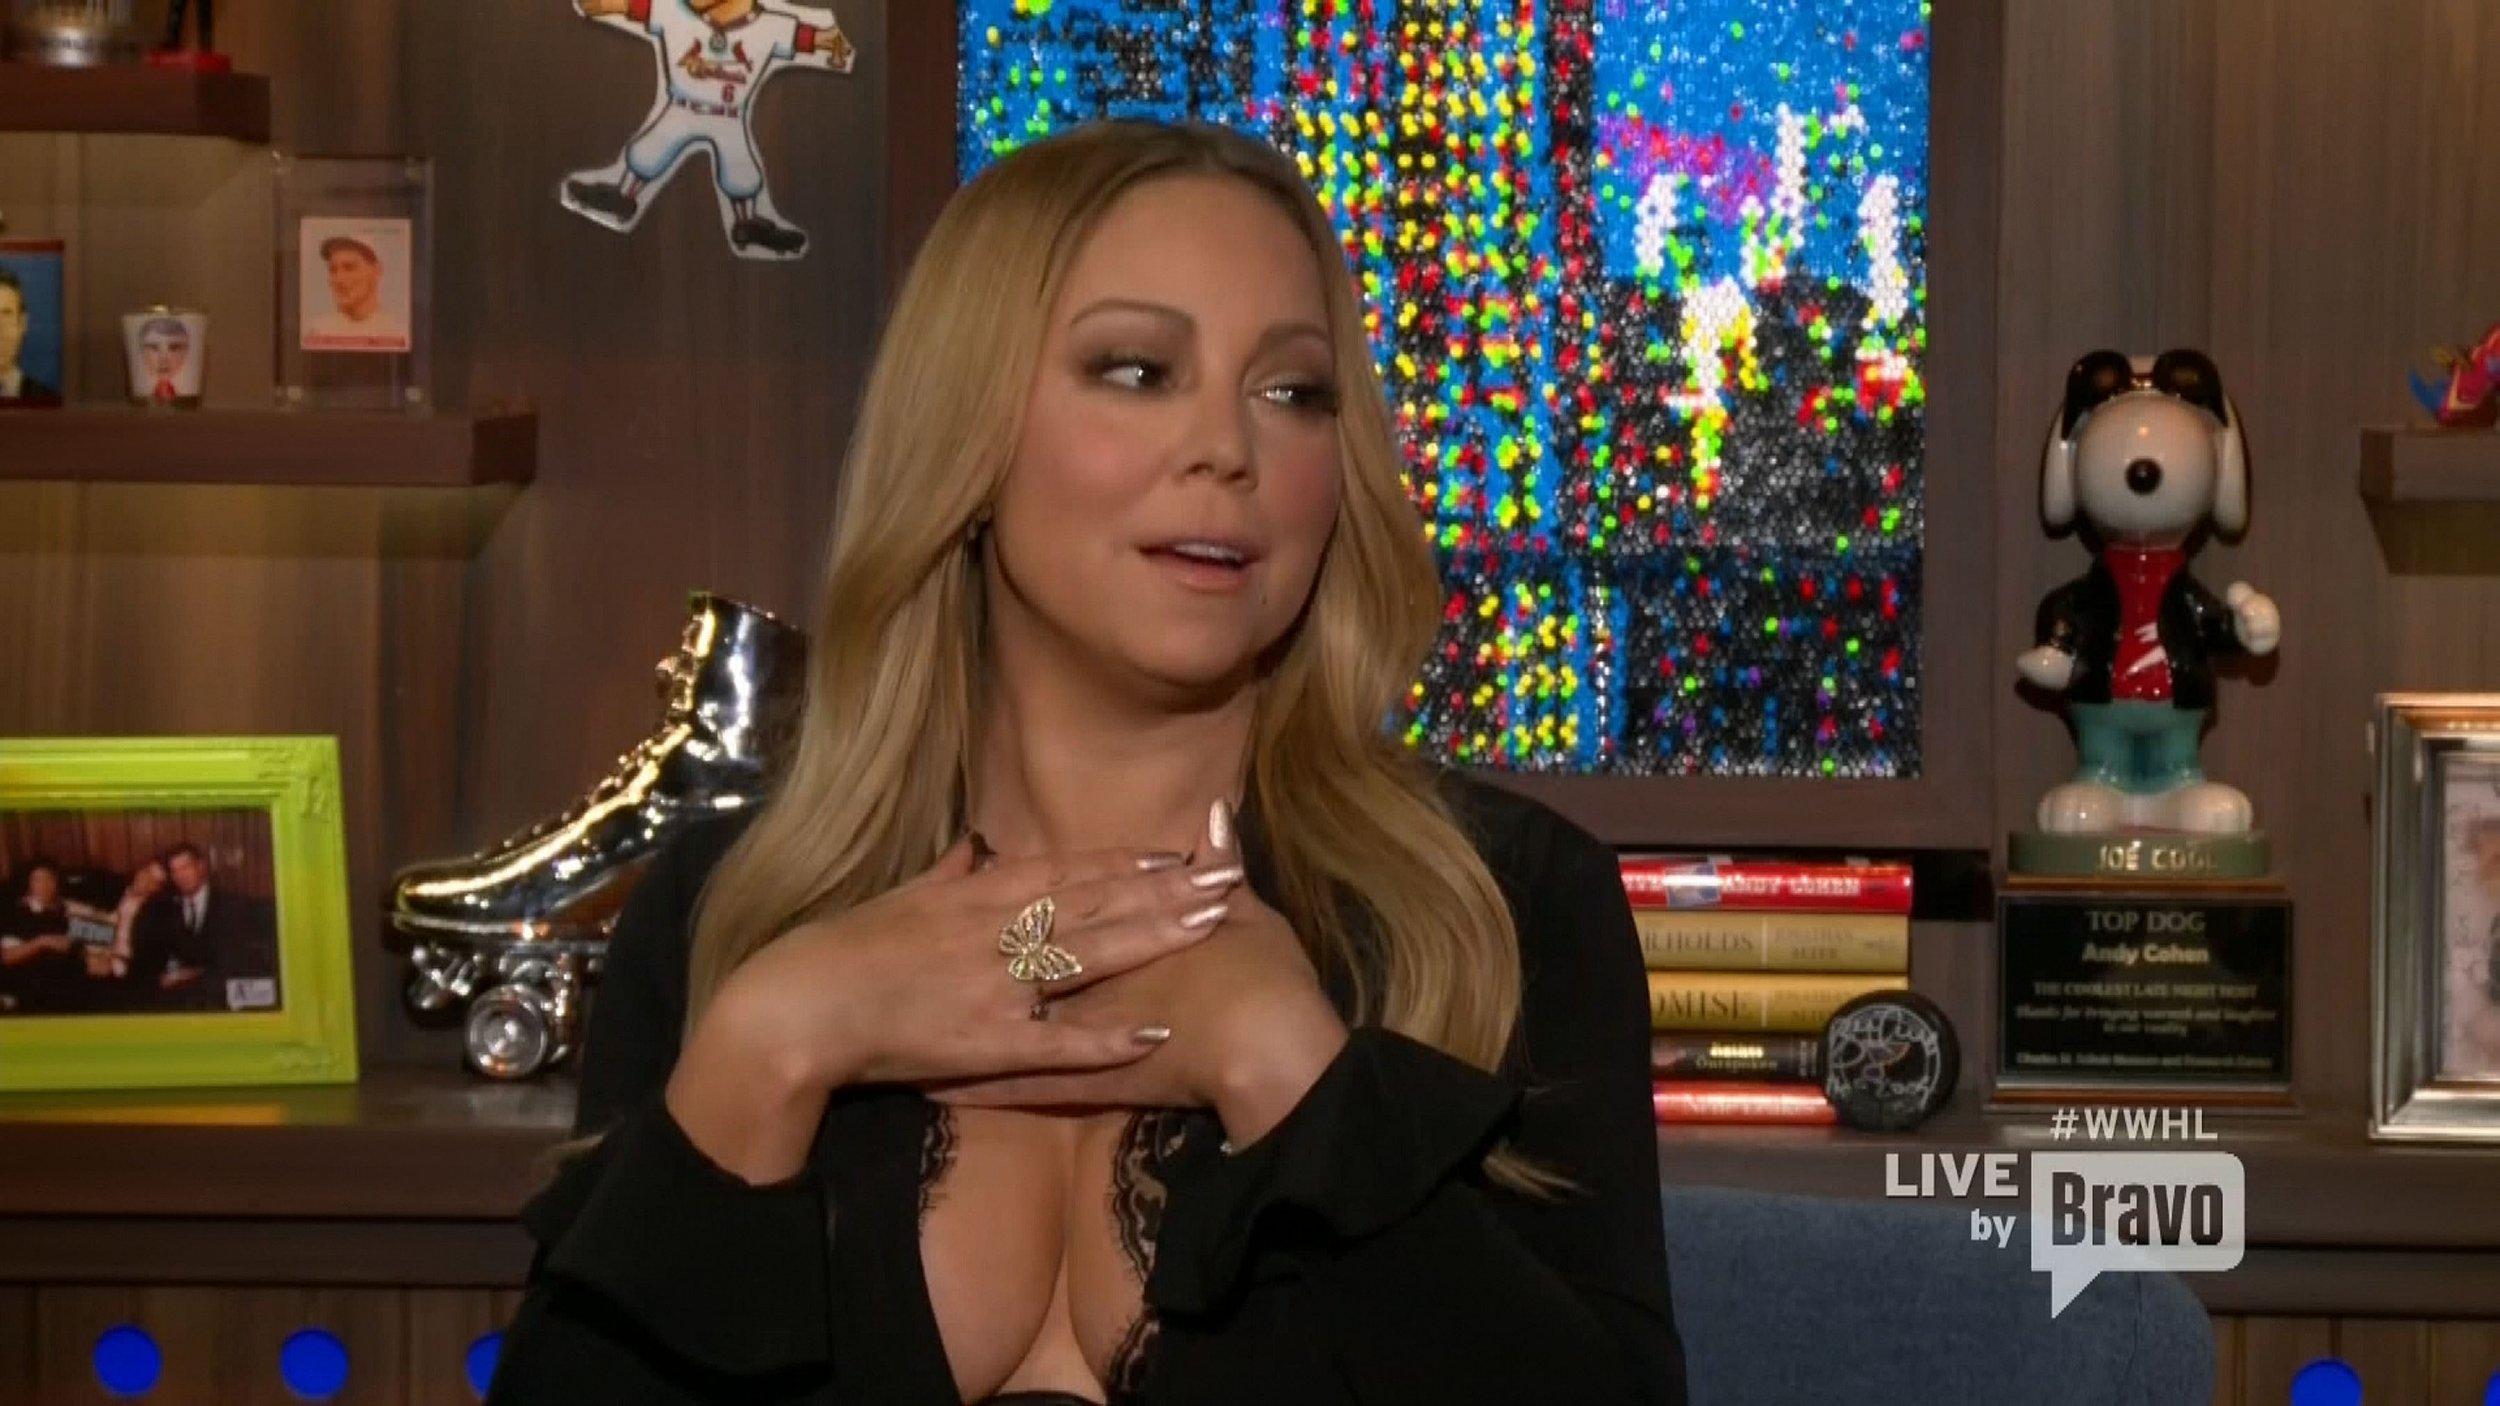 Mariah Carey has just thrown massive shade at Nicki Minaj and JLo. Again.